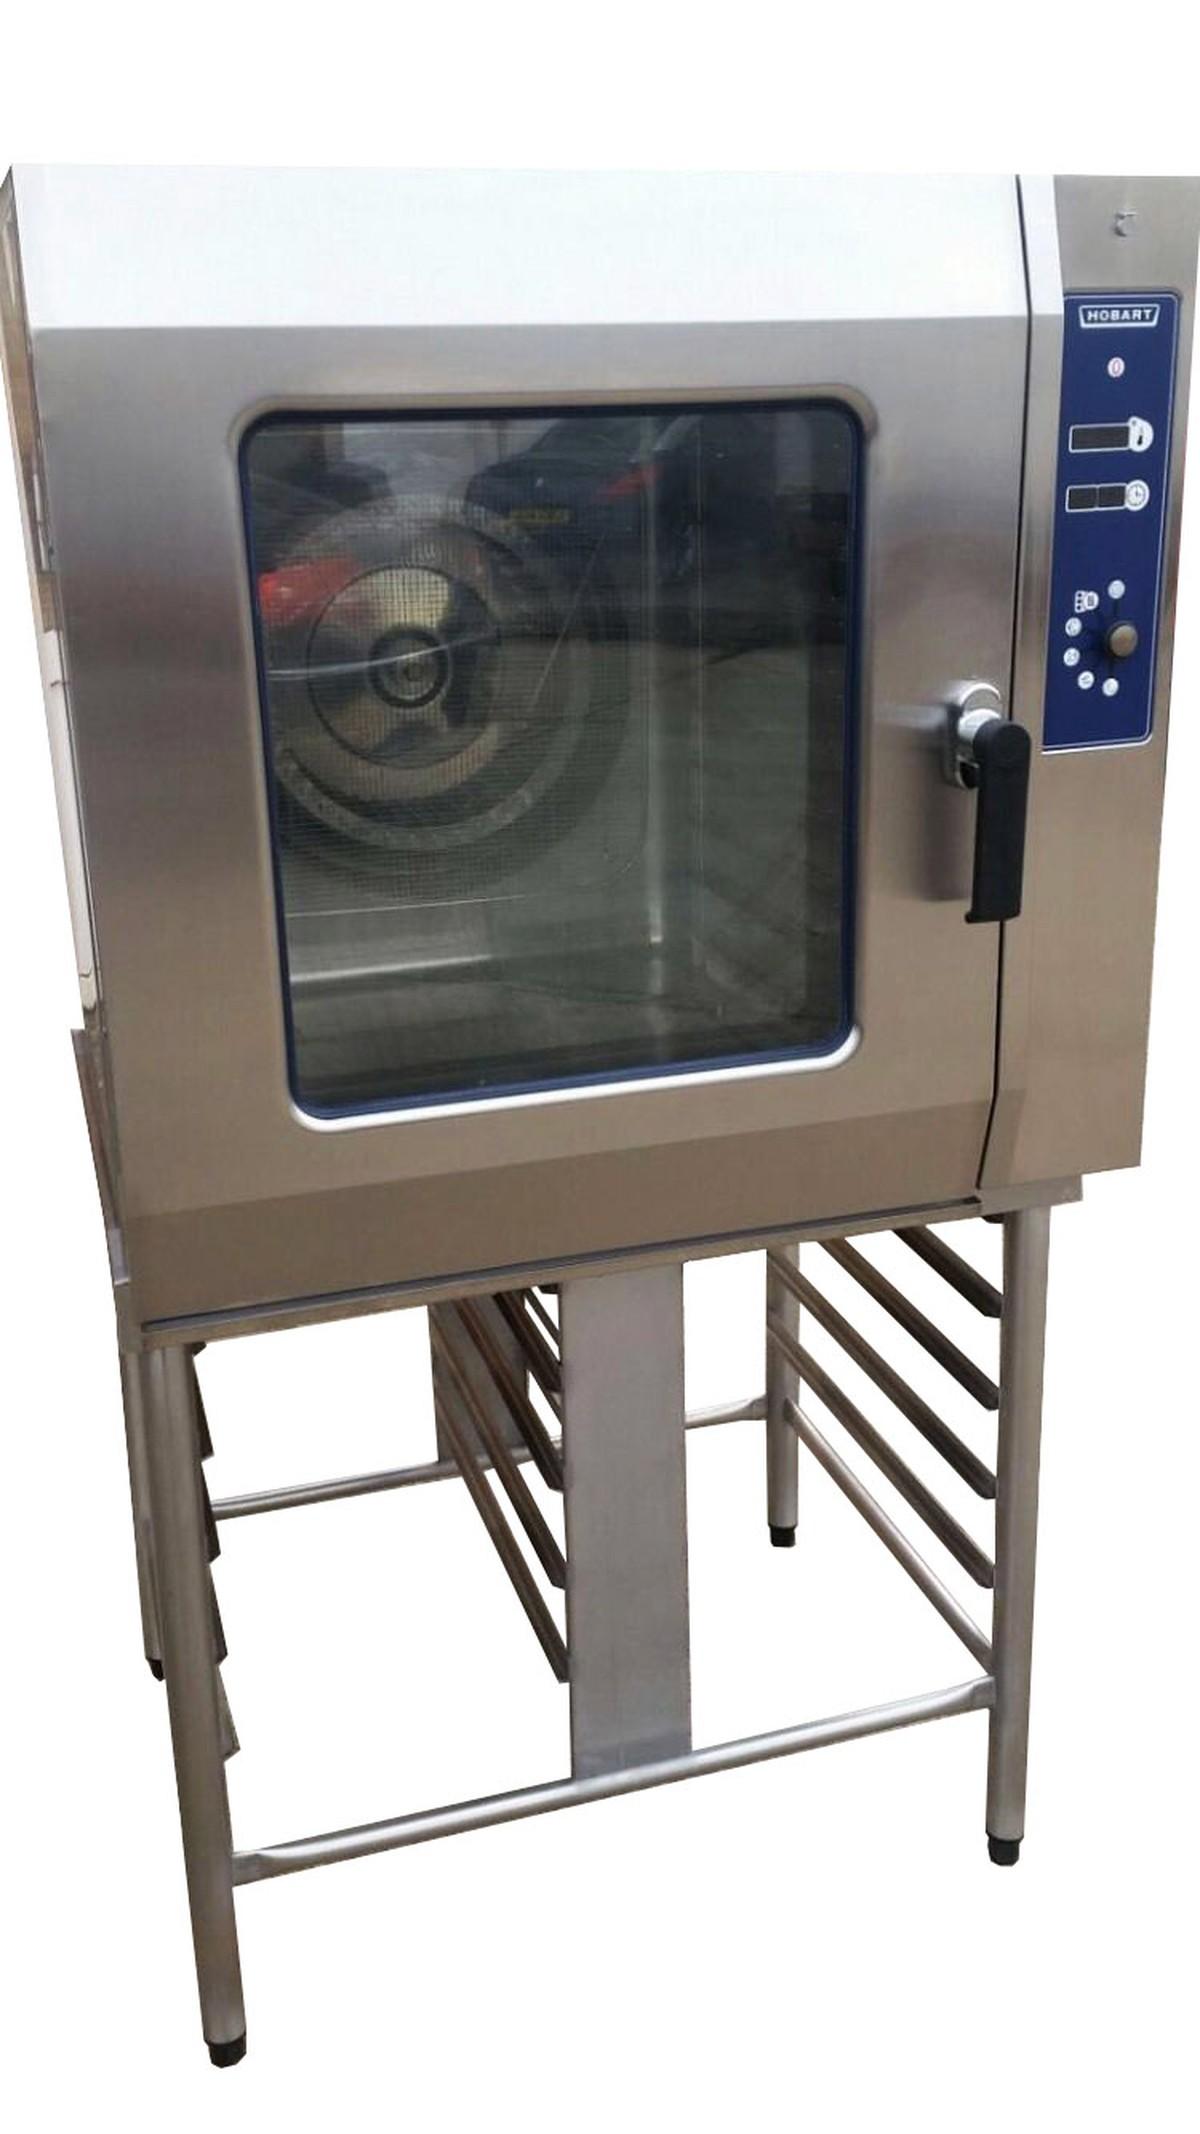 Catering Equipment Rentals Combi Ovens Electric Hobart